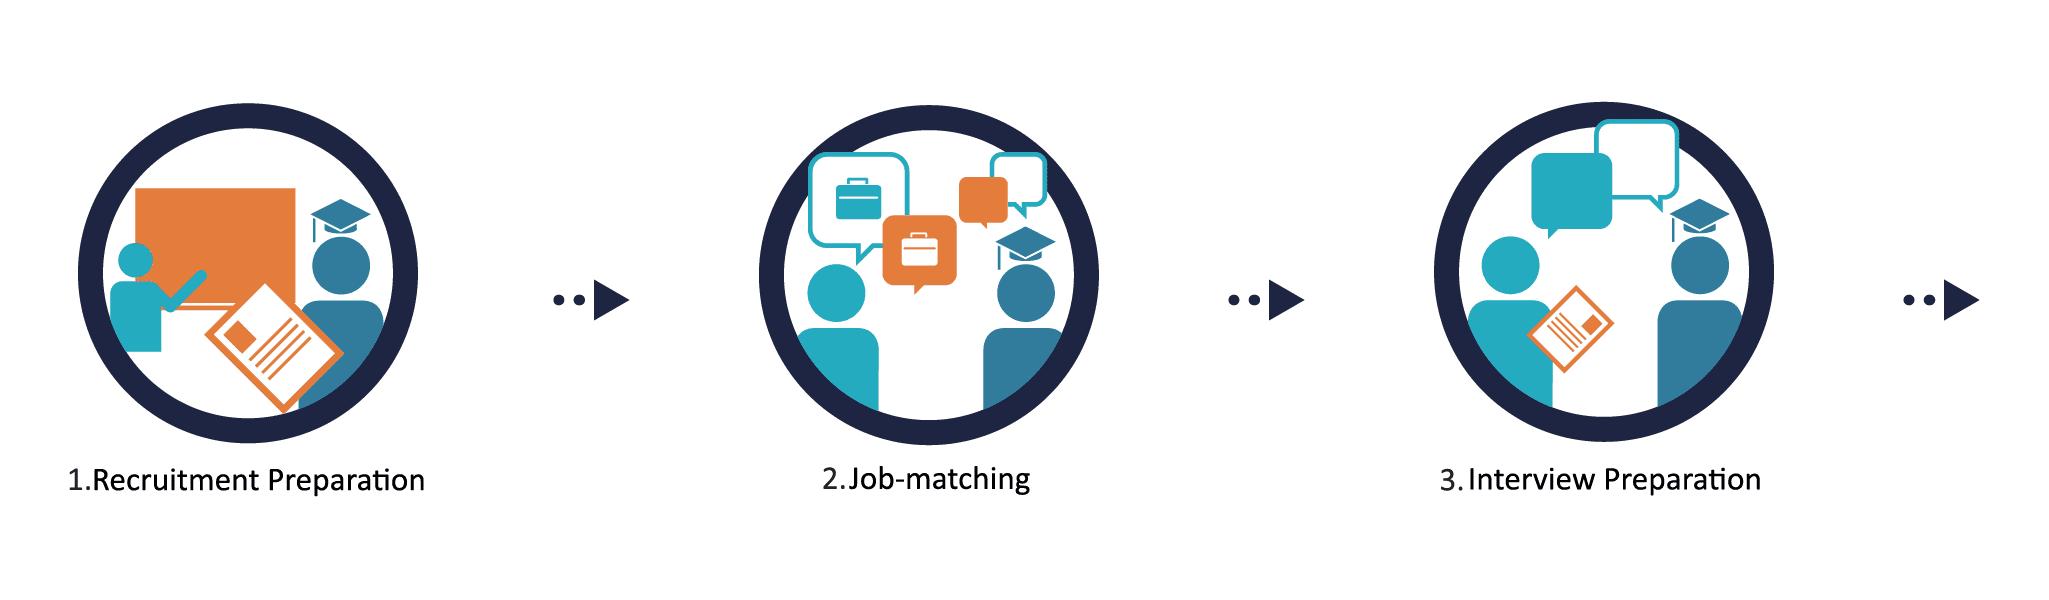 1. Recruitment Preparation  2. Job-matching  3. Interview Preparation